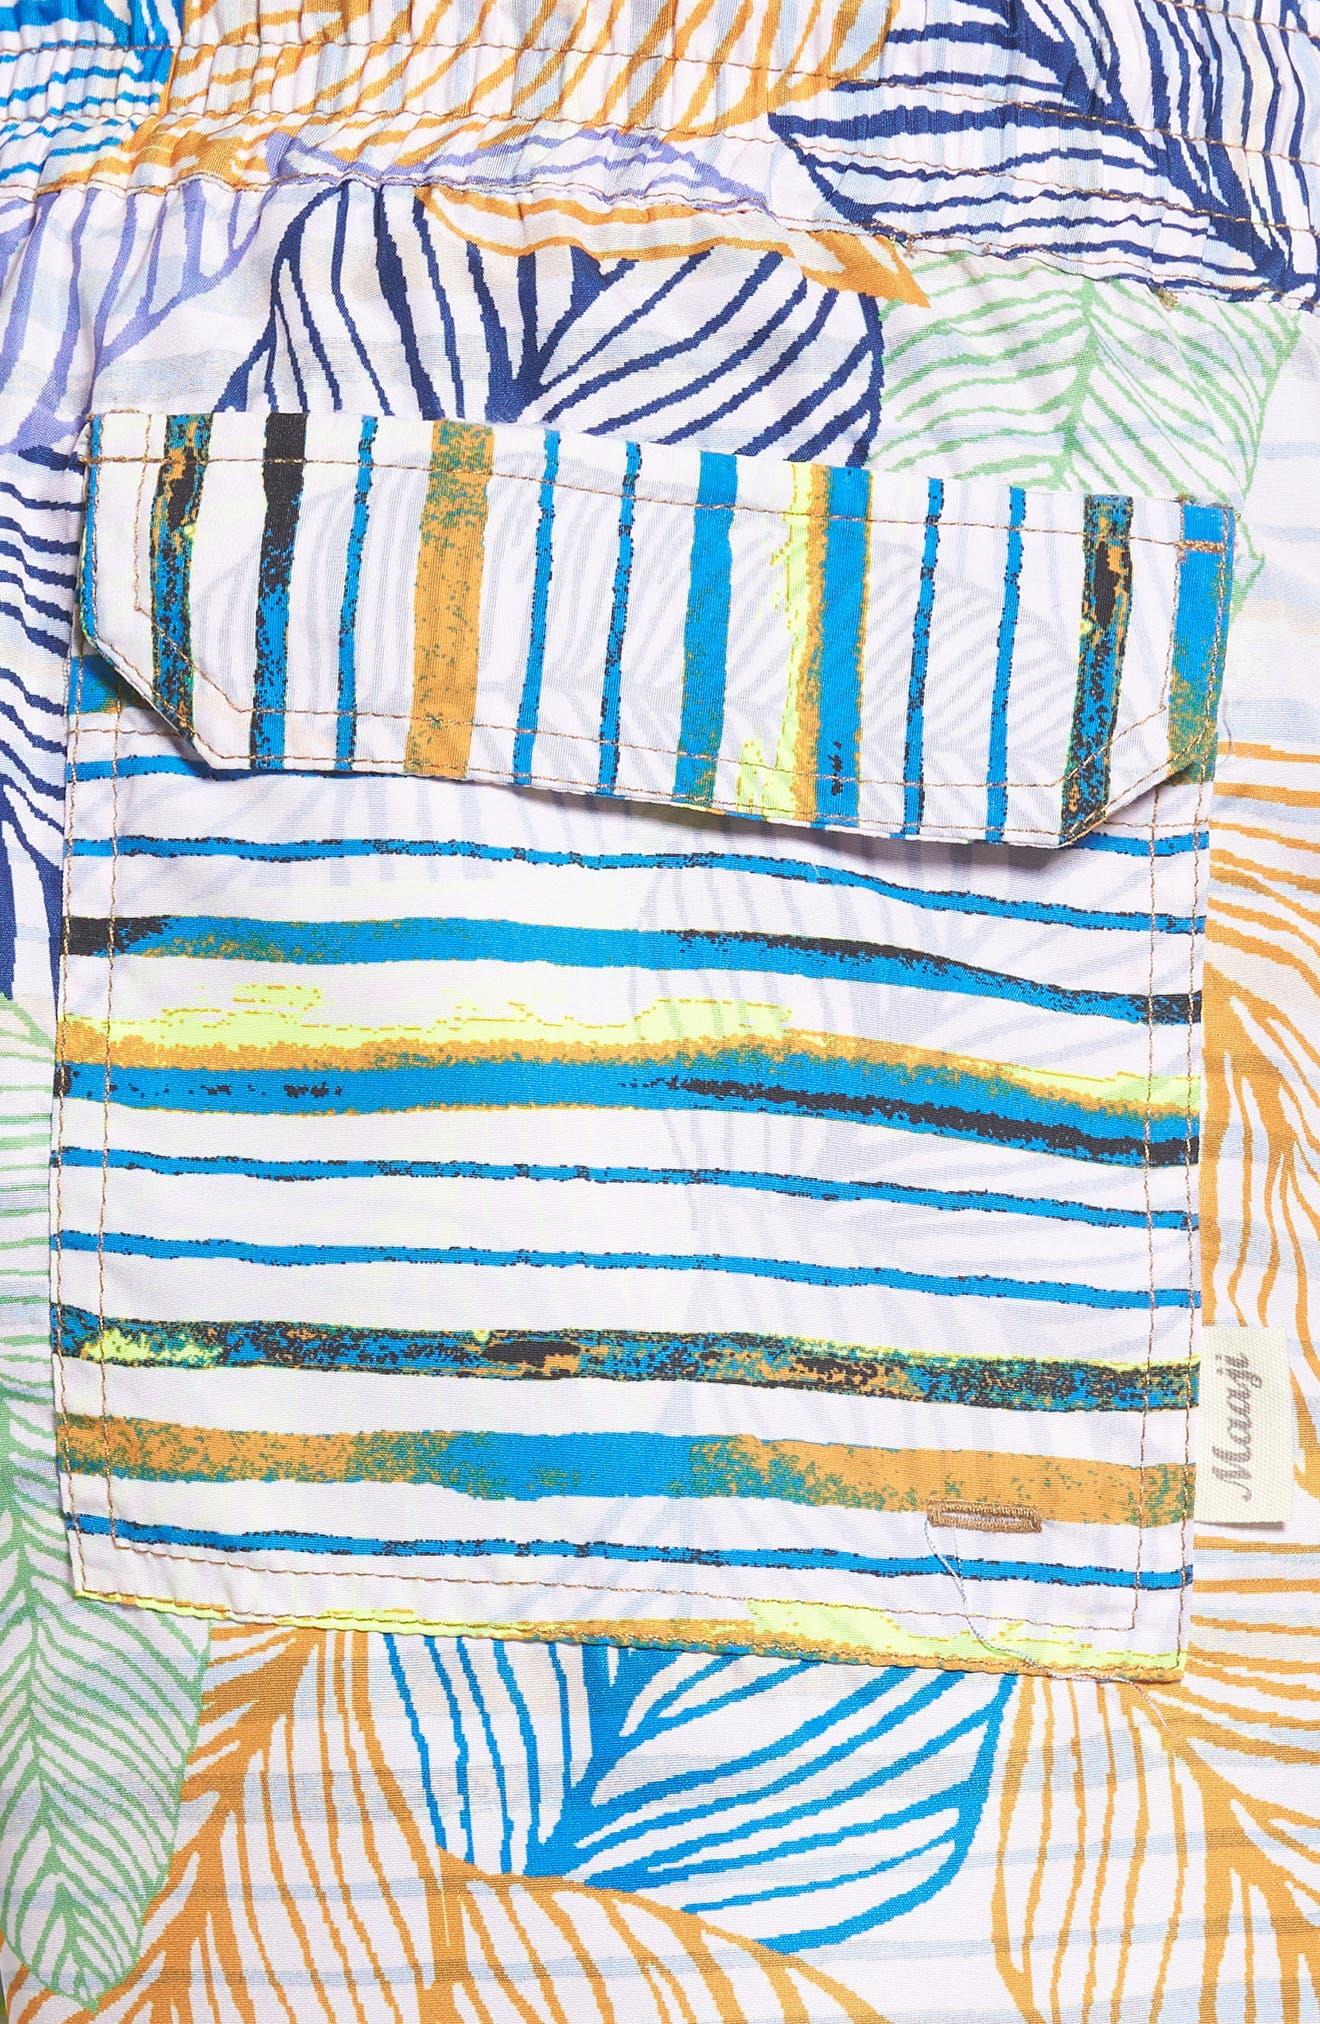 Blue Sky Reversible Swim Trunks,                             Alternate thumbnail 4, color,                             Multicolor